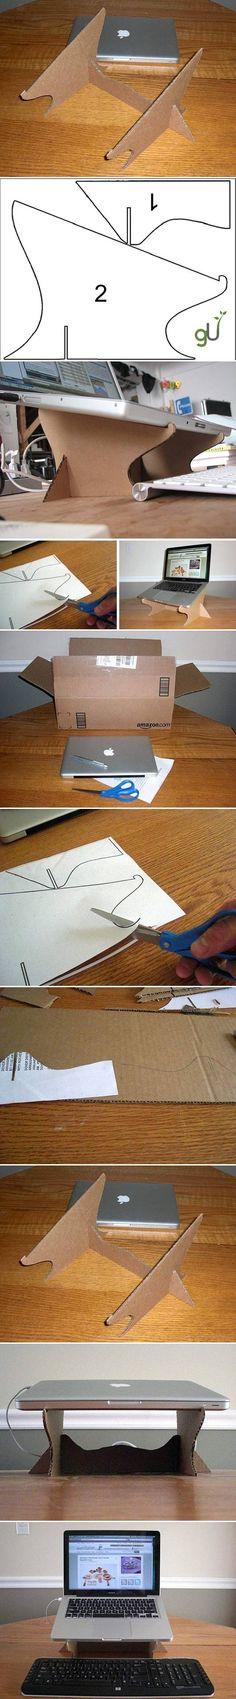 DIY Simple Cardboard Laptop Stand diy craft crafts easy crafts diy ideas diy…